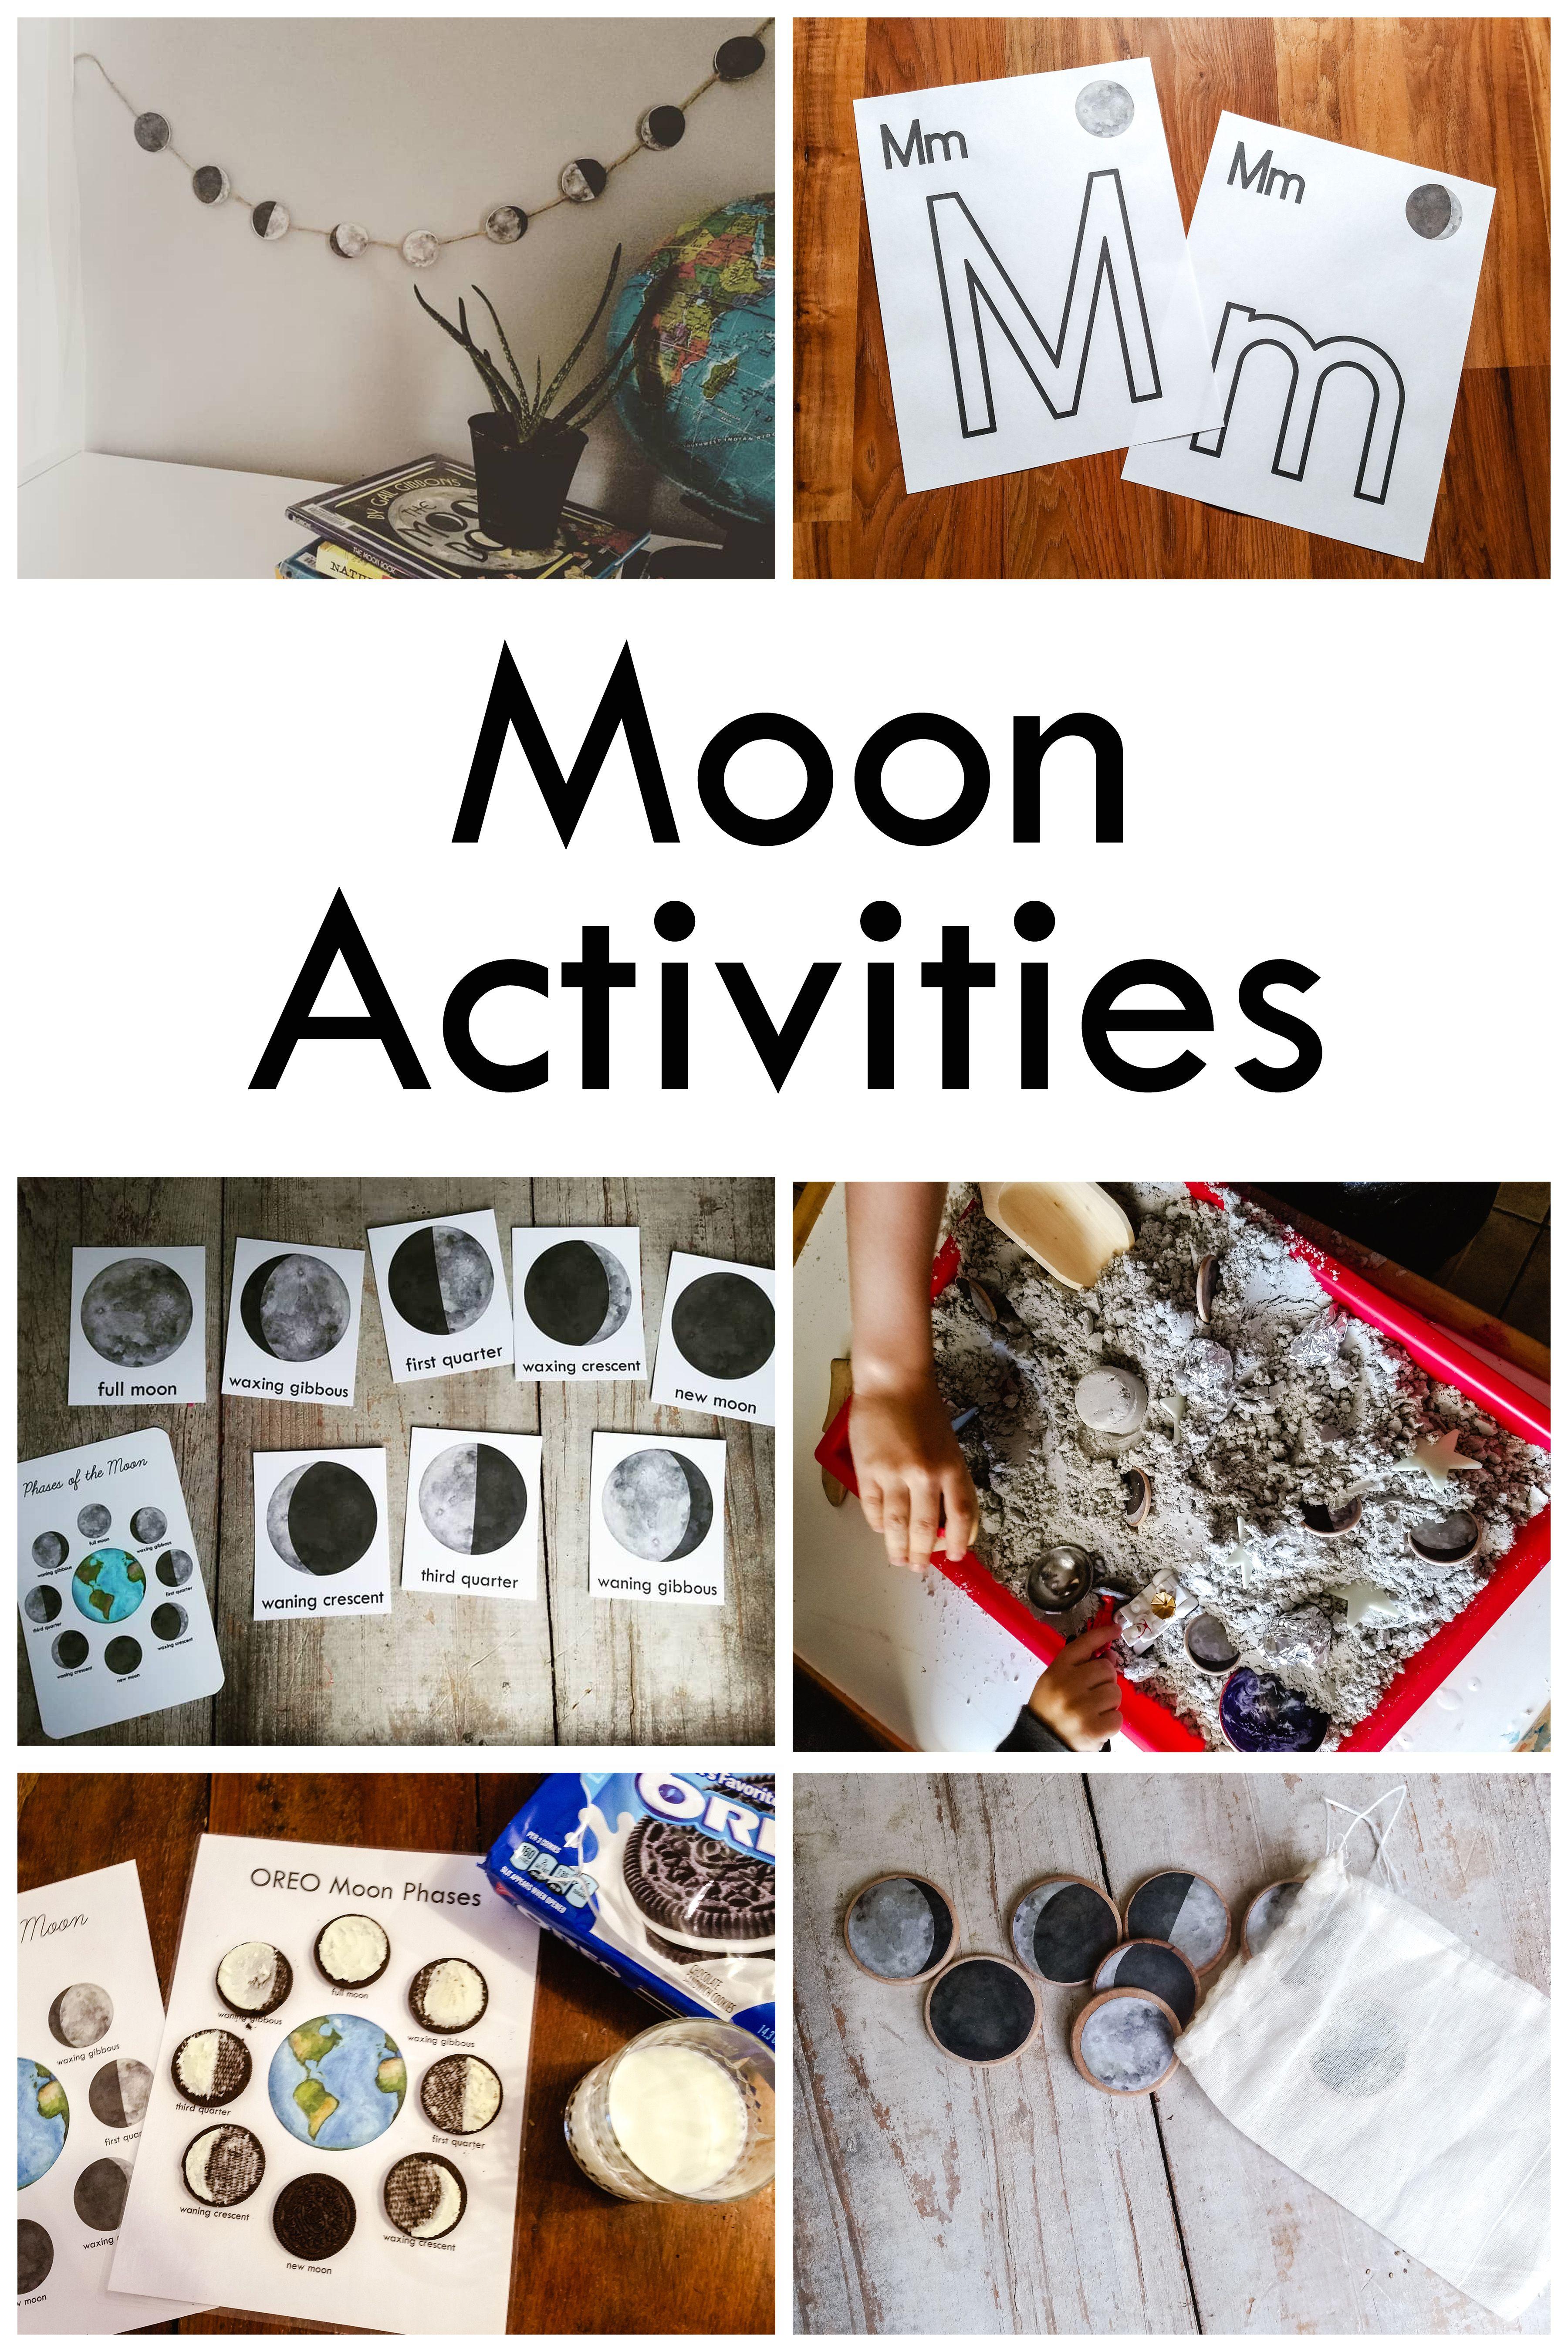 Moon Phase Activities